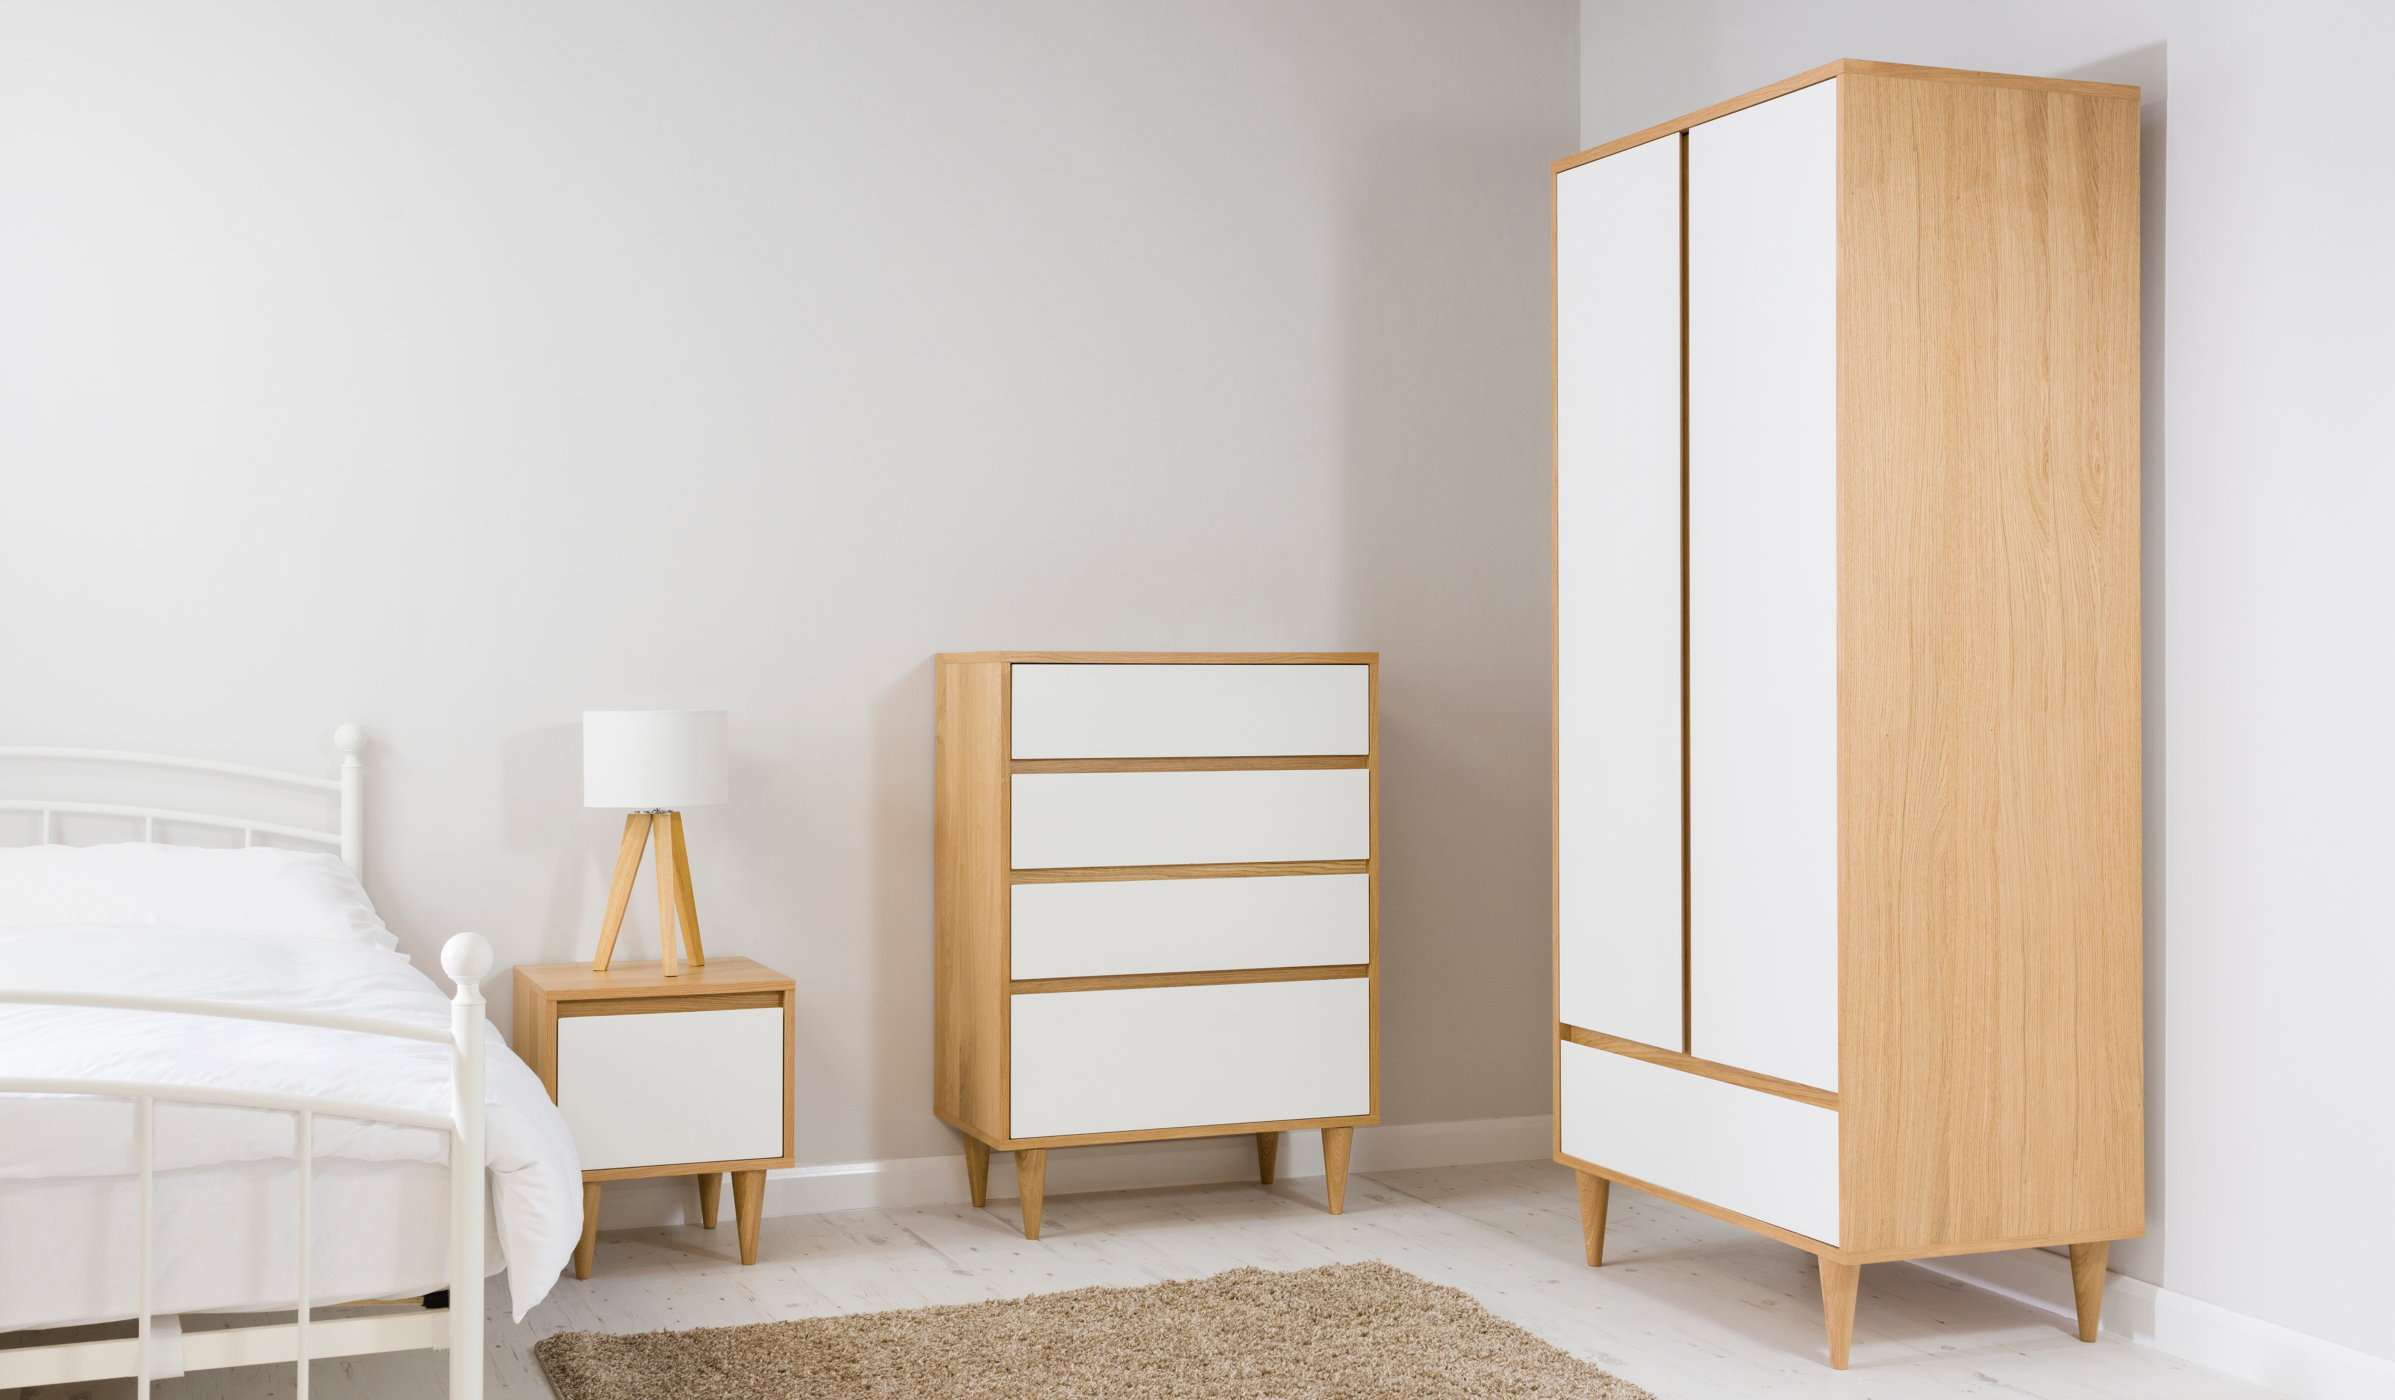 White Bedroom Furniture Uk george home wynne bedroom furniture range - oak effect and white